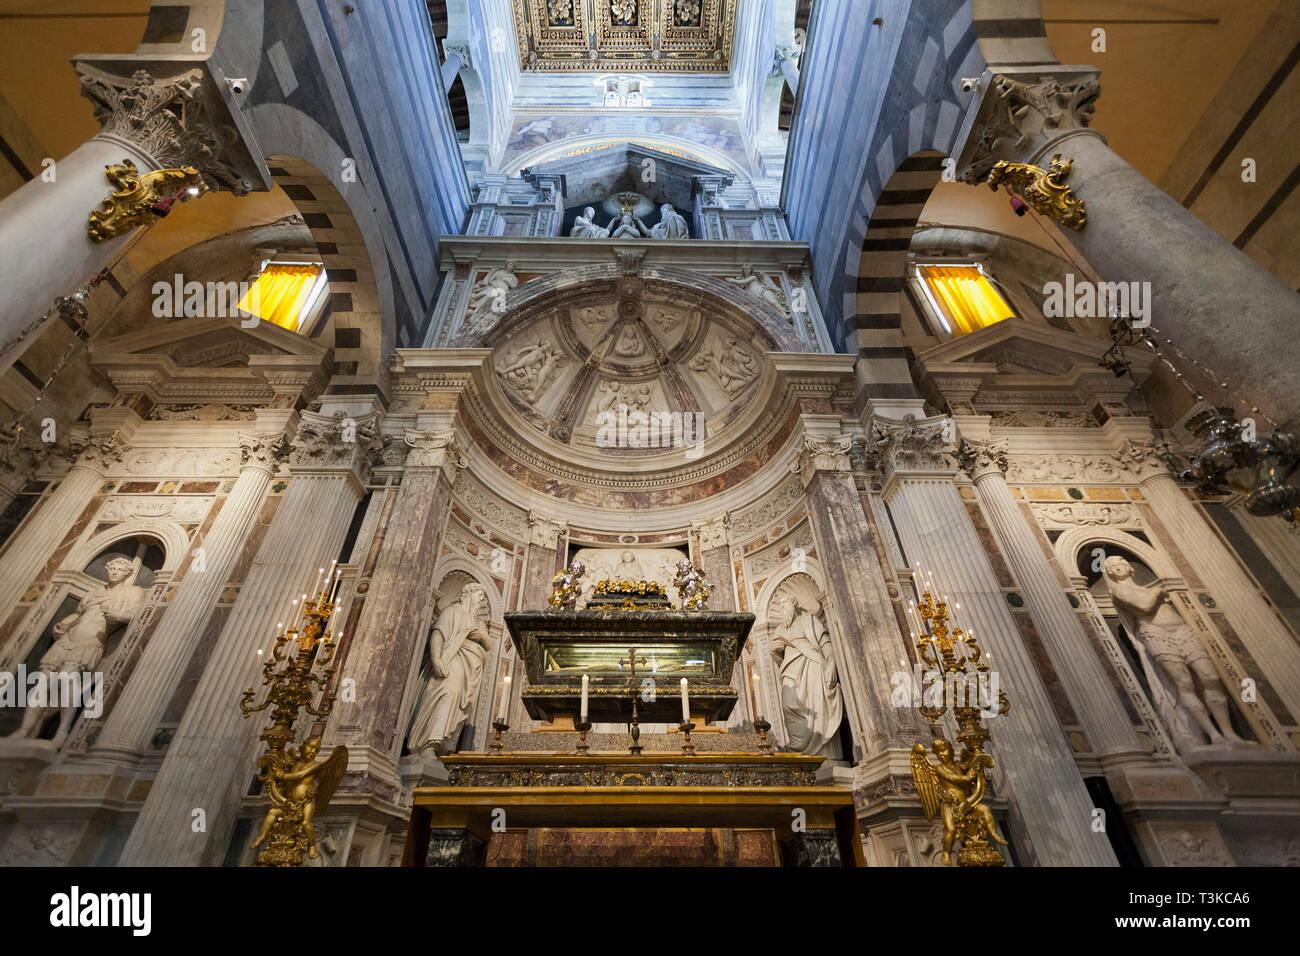 Altar of St. Rainerius, Pisa Cathedral Stock Photo